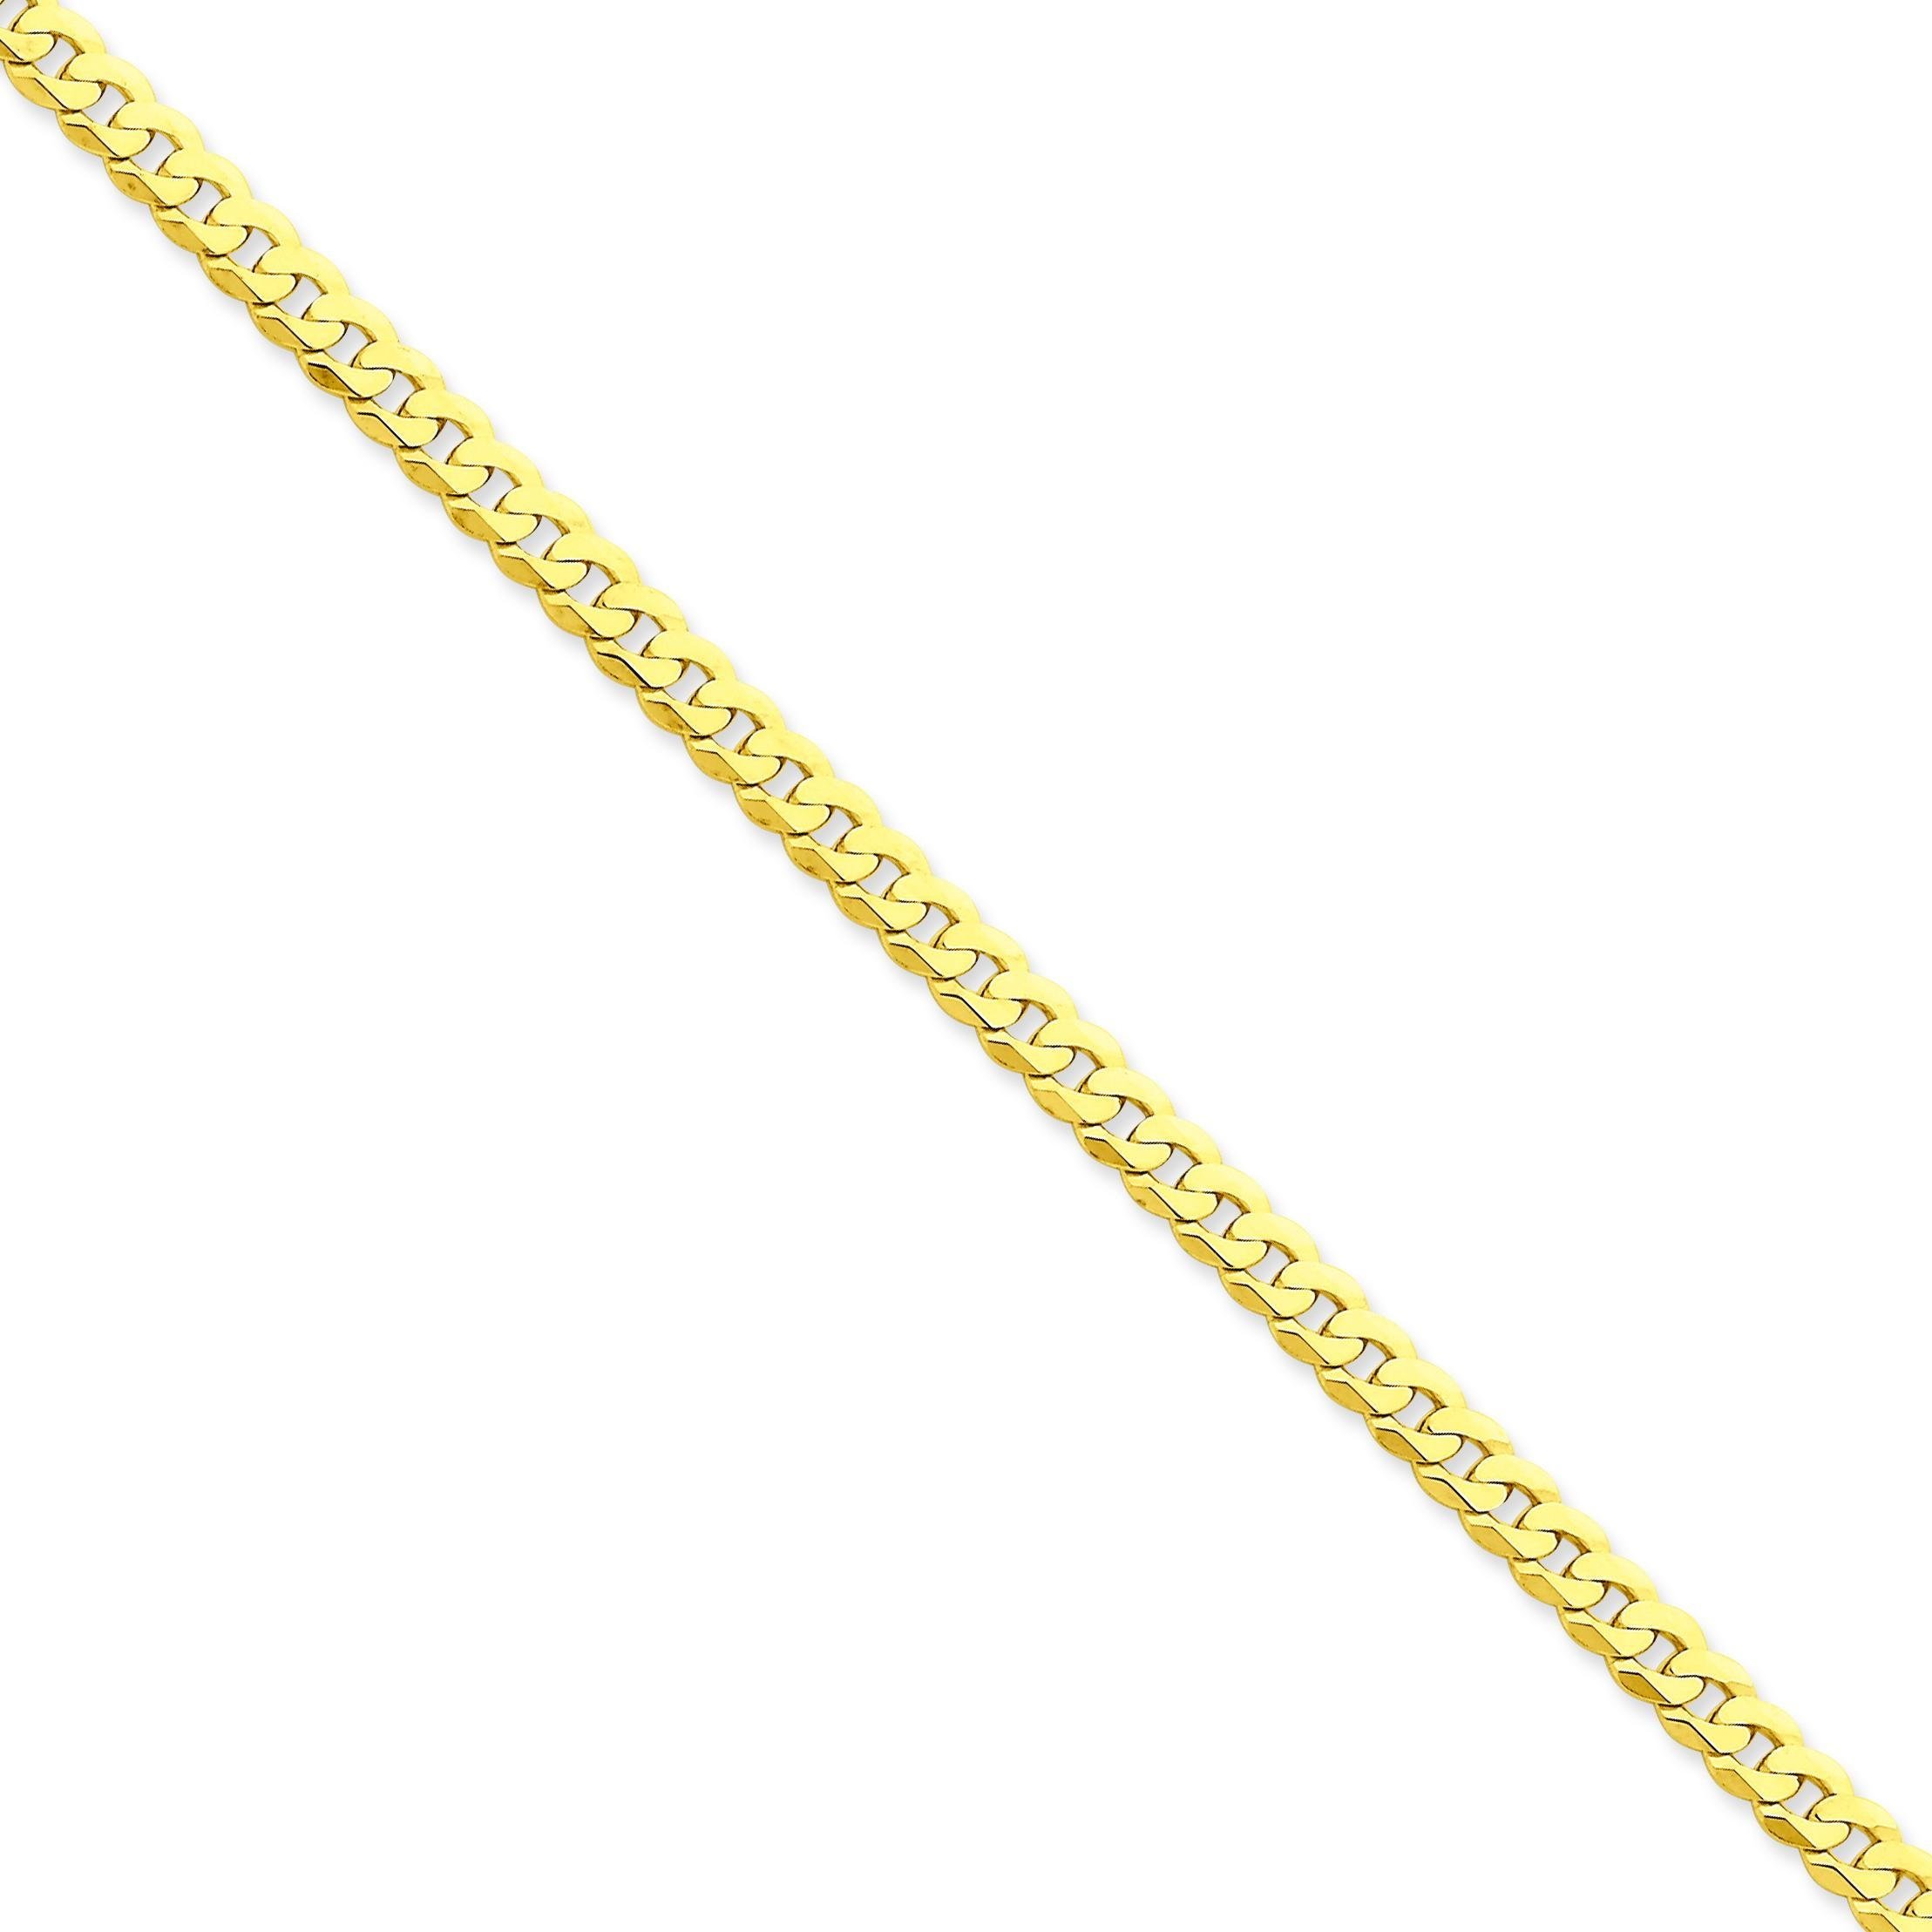 14k Yellow Gold 7 inch 4.60 mm Flat Beveled Curb Chain Bracelet